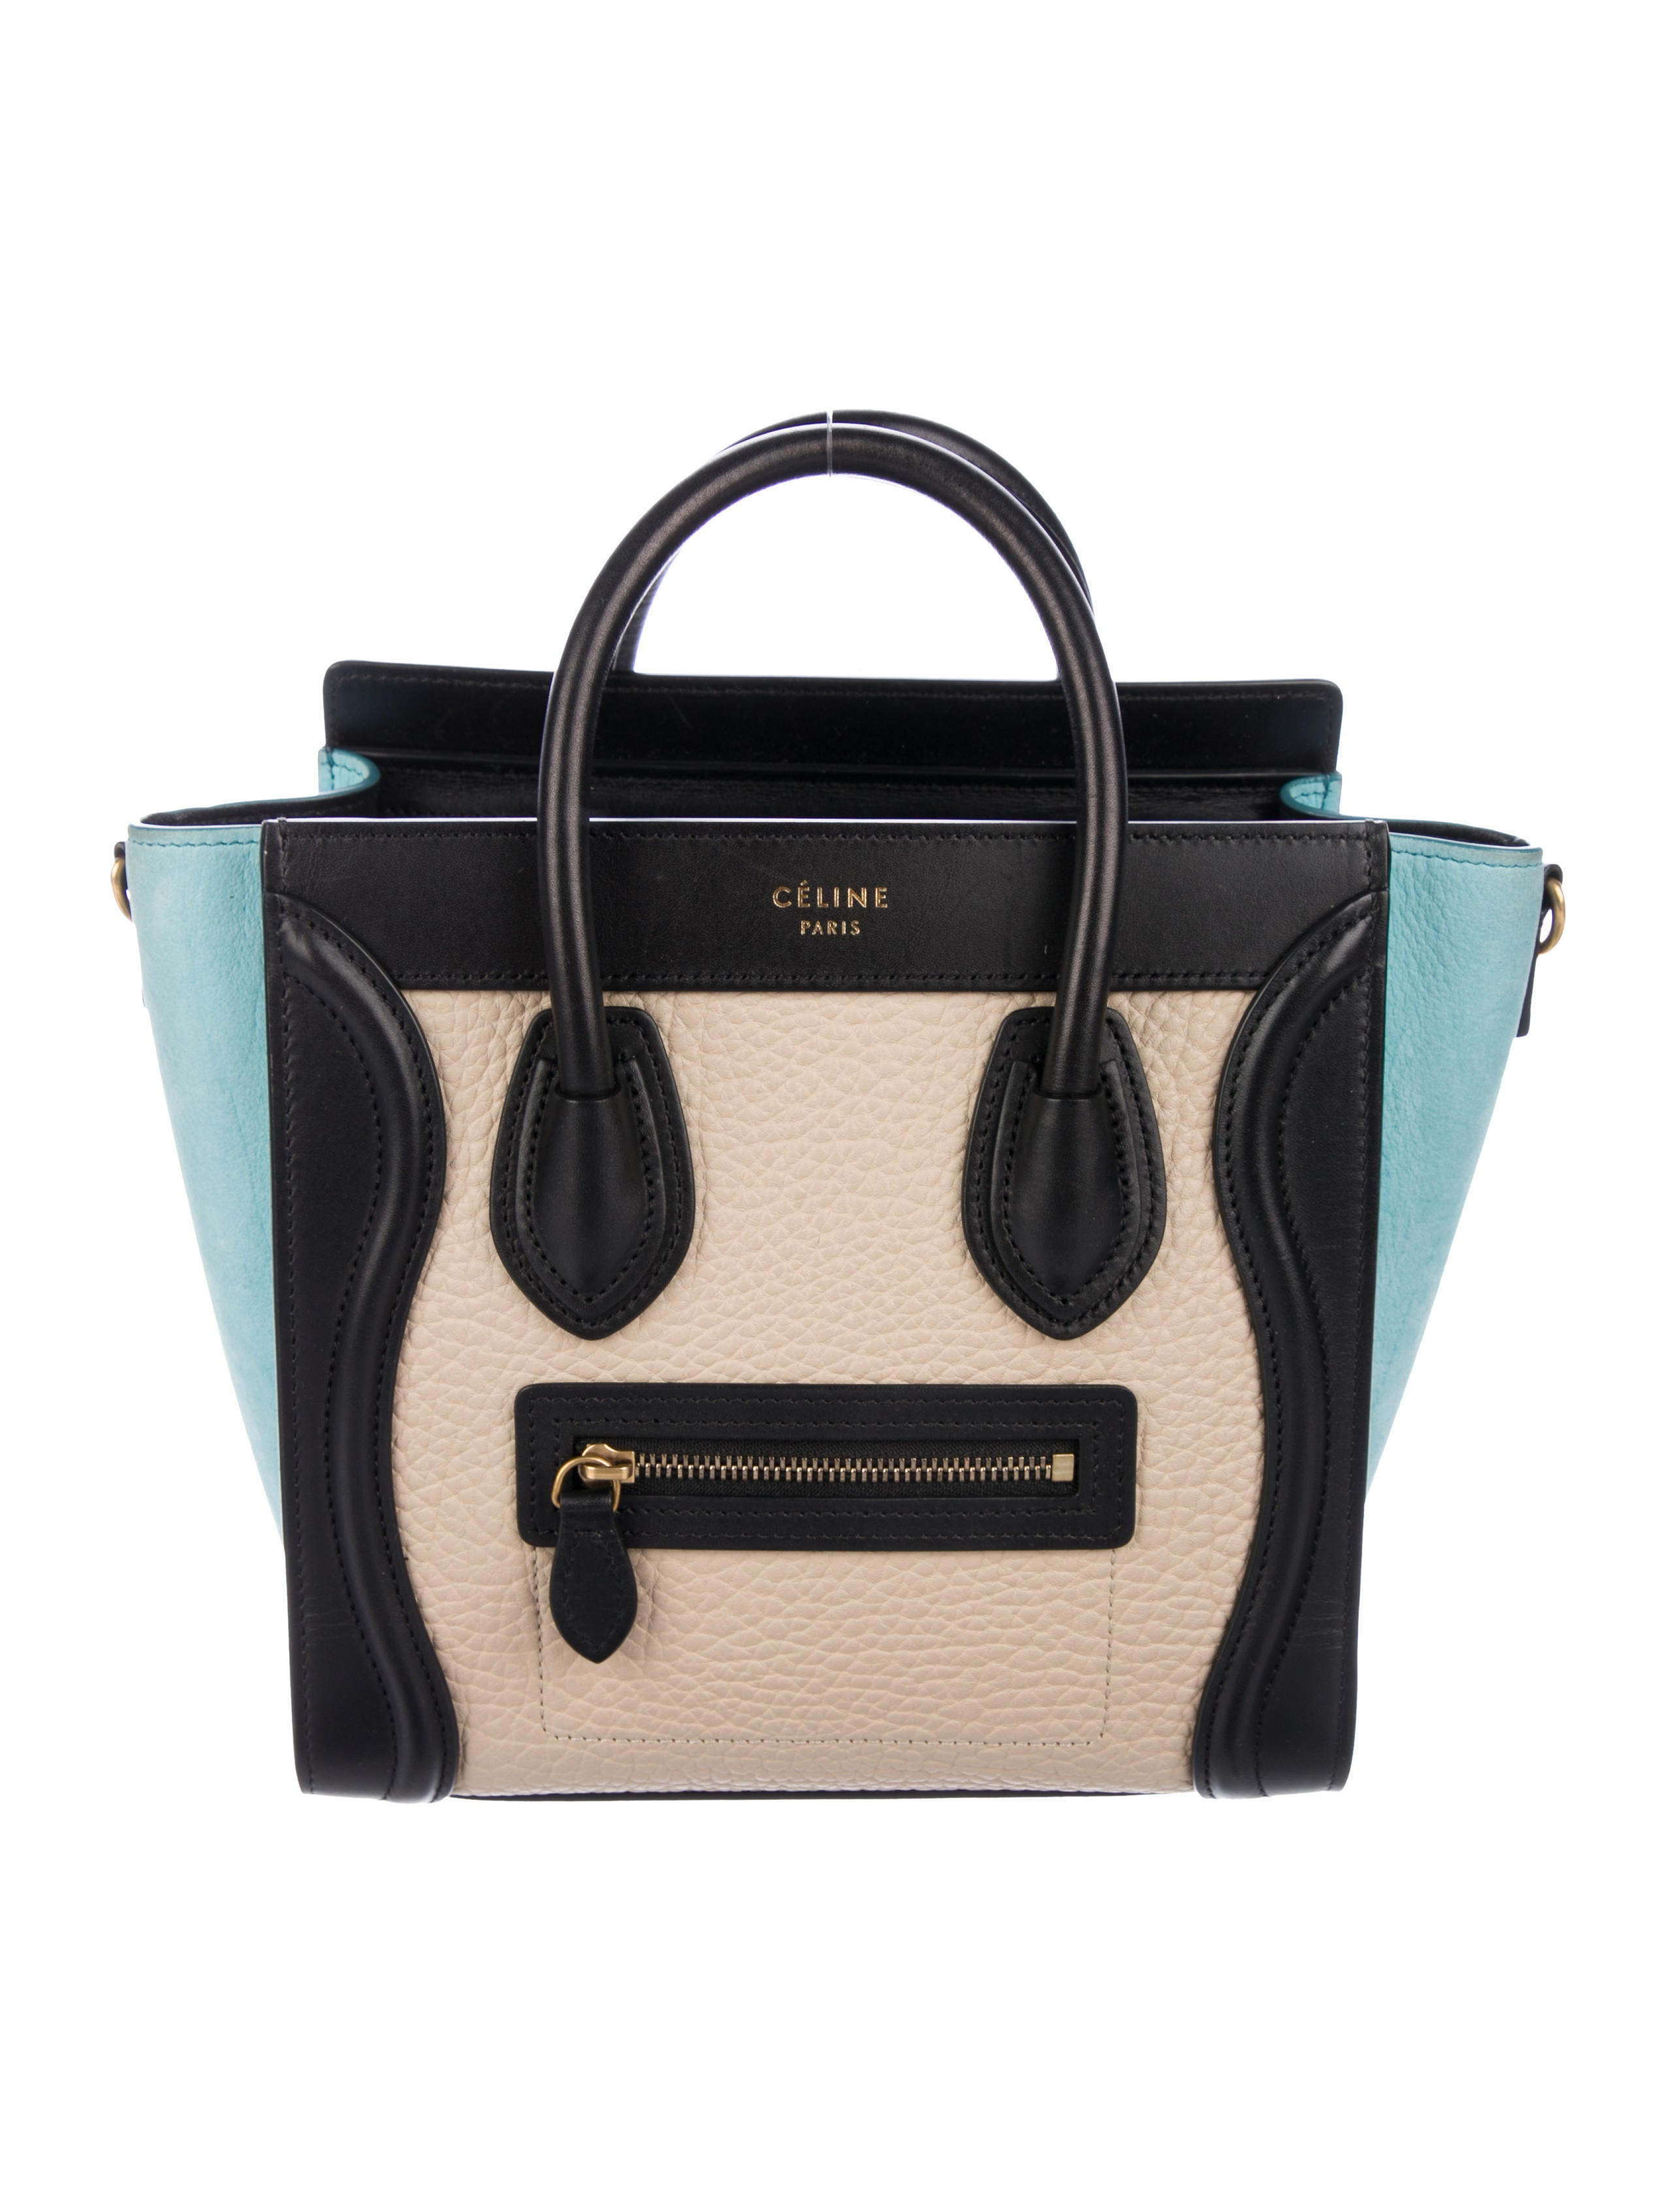 7b41ae71ffa55 Celine Céline Tricolor Micro Luggage Tote - Handbags - CEL80579 ...